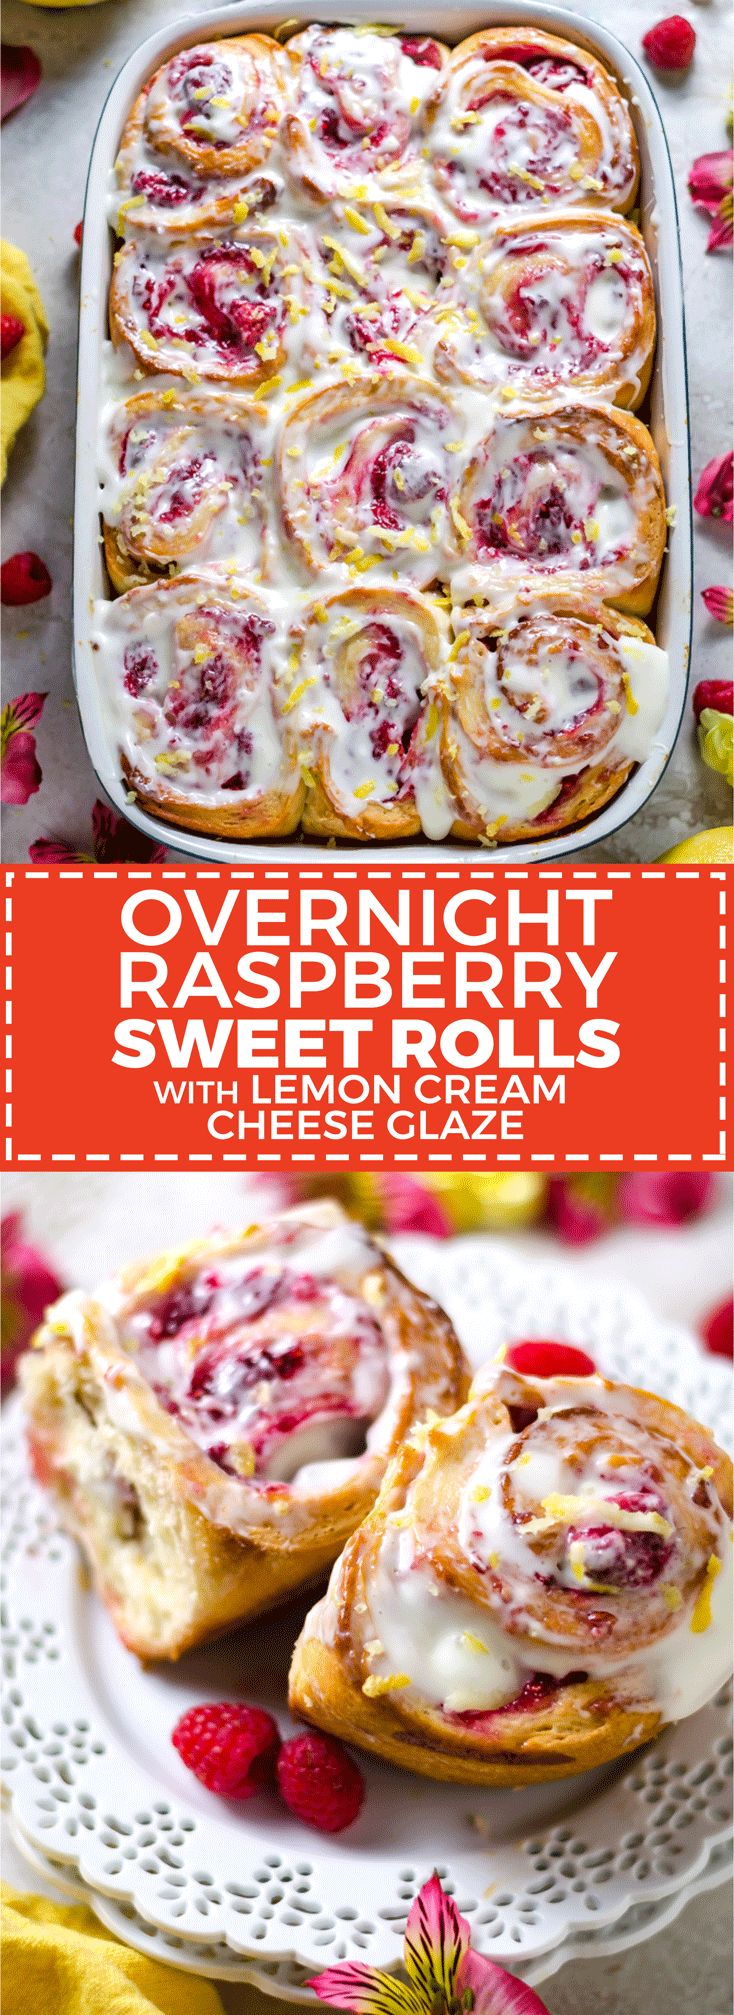 Overnight Raspberry Sweet Rolls with Lemon Cream Cheese Glaze. A brunch-lover's dream. | ad | hostthetoast.com  BobsSpringBaking @bobsredmill